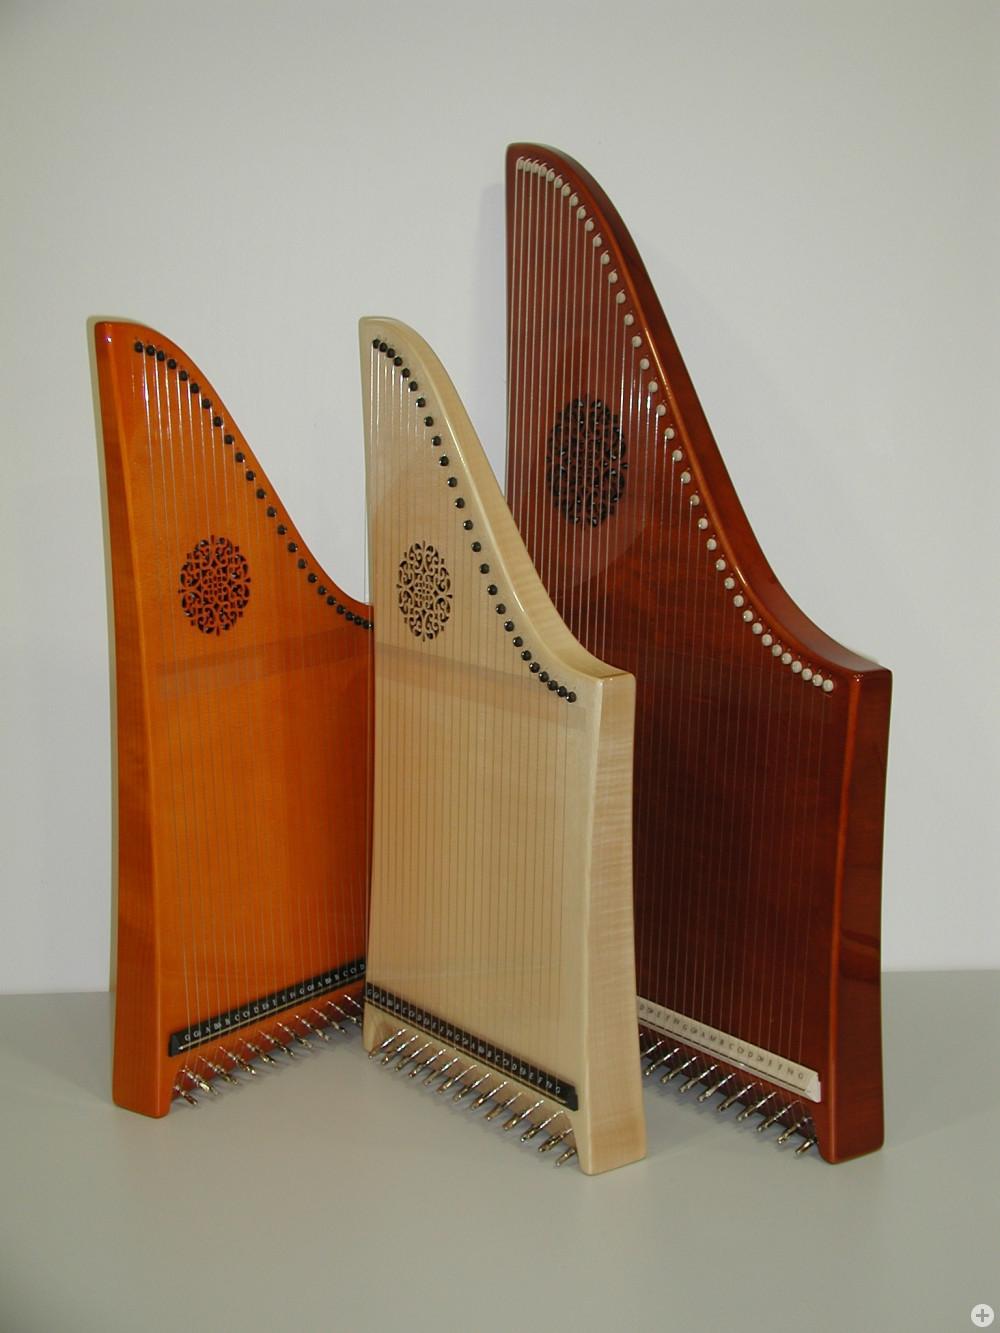 Veeh-Harfen